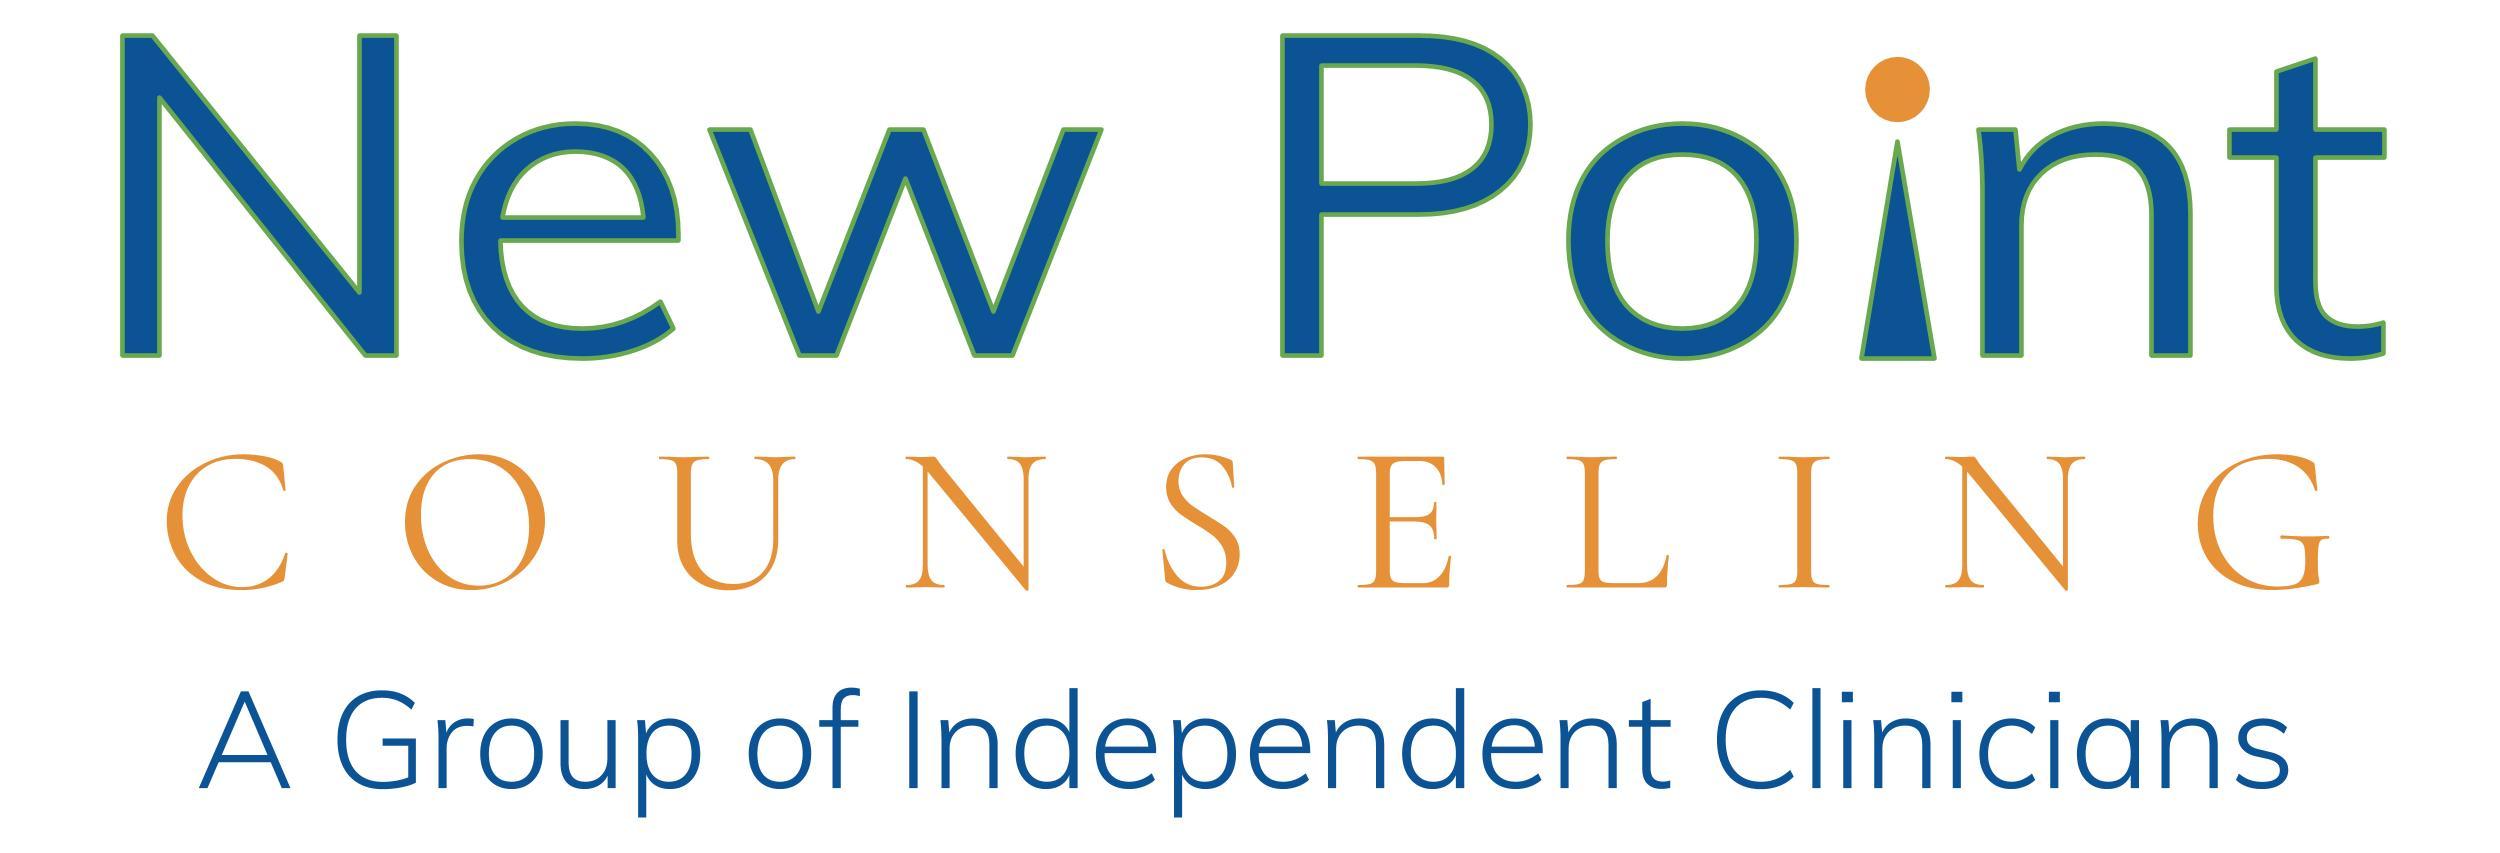 New Point website logo (updated 1.14.19) (1).jpg